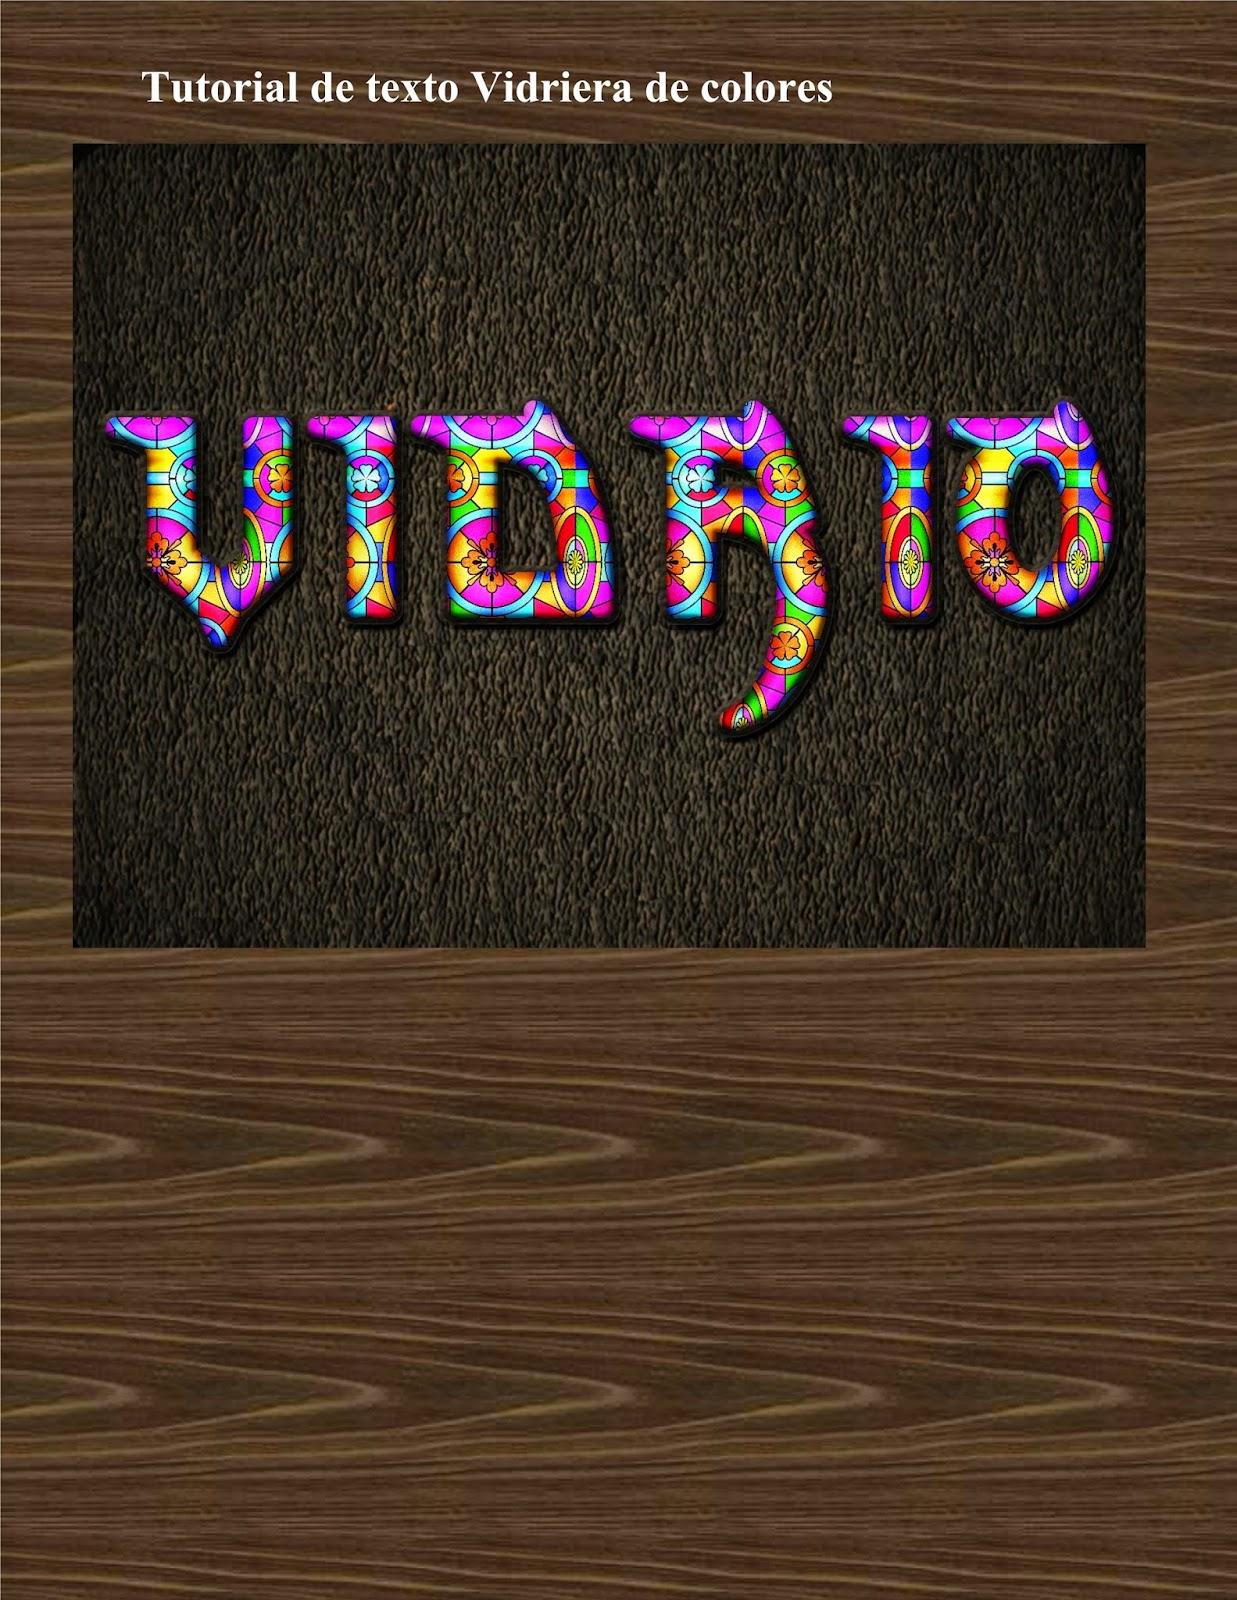 Gimp nexux tutoriales tutorial texto de vidrieras de colores - Vidrieras de colores ...